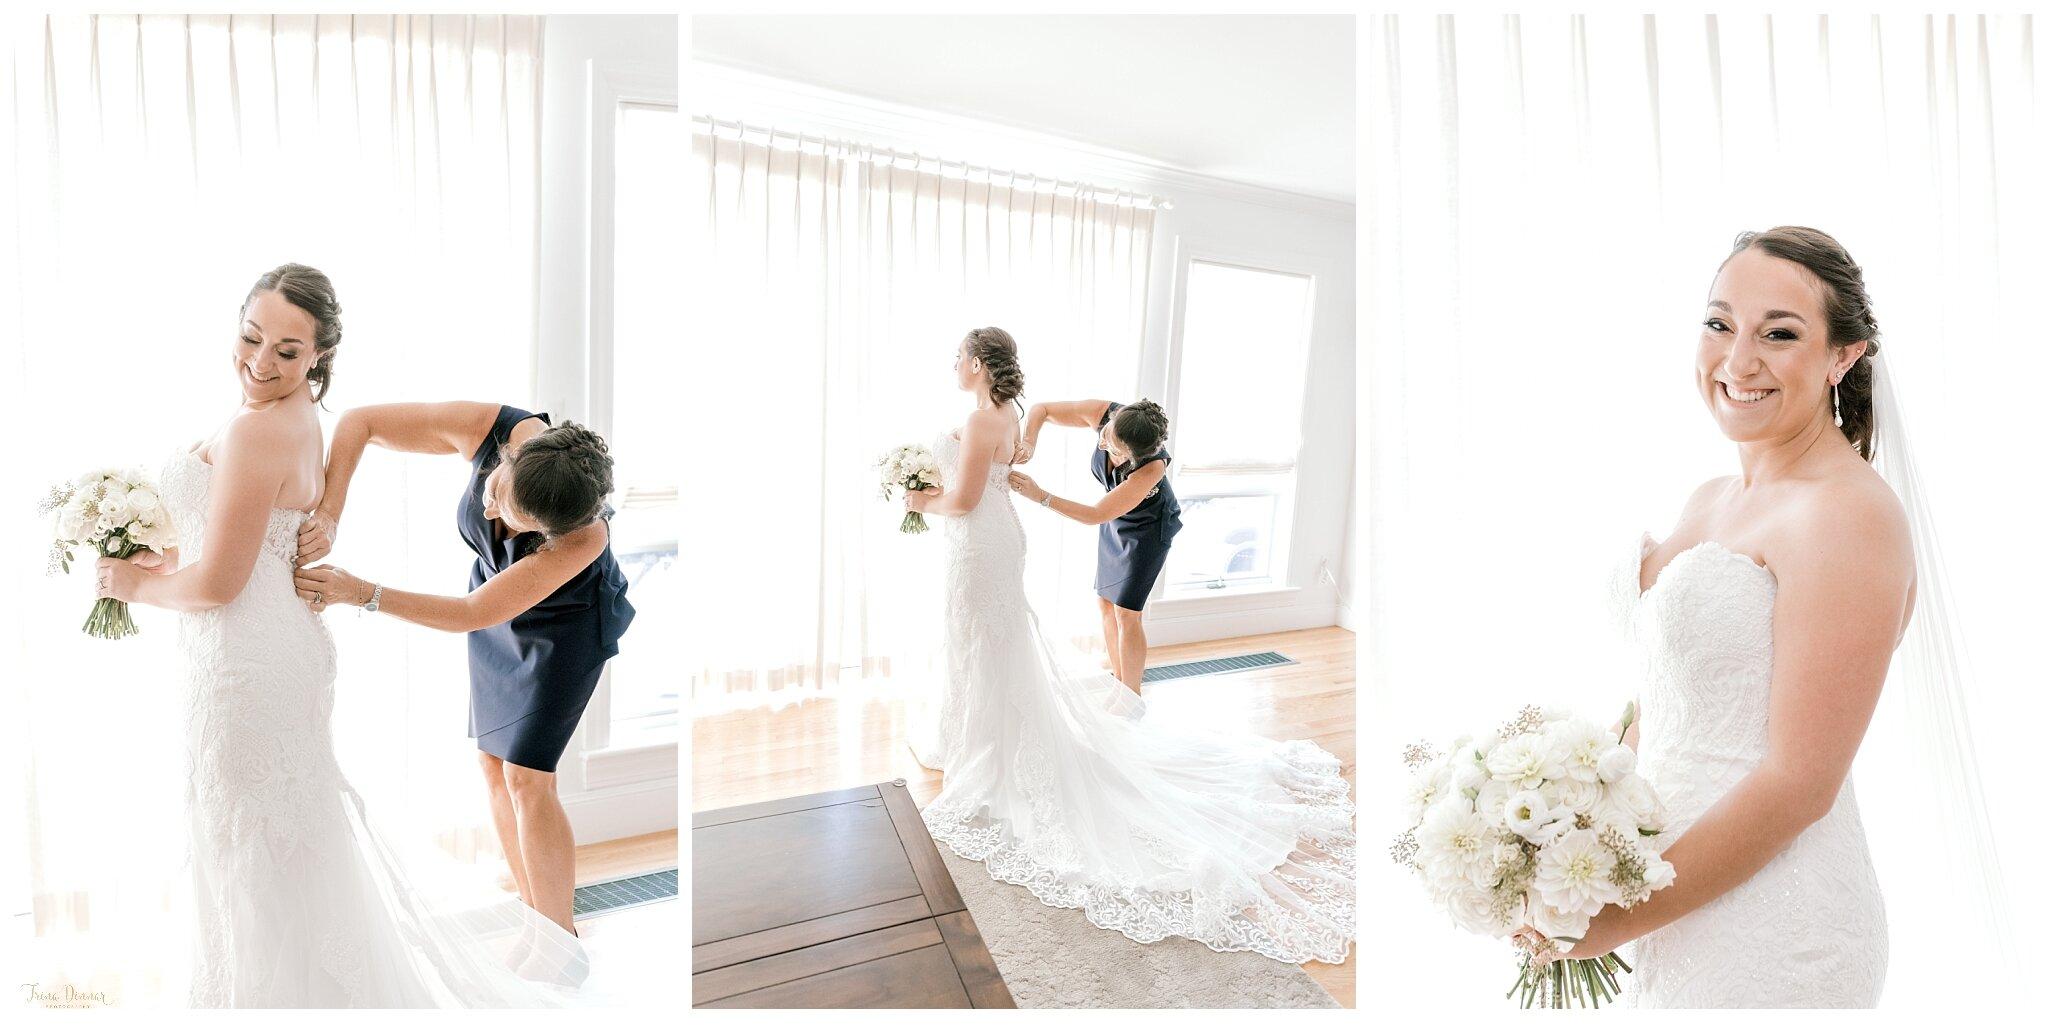 Danielle's Portland Maine Bridal Wedding Day Portrait Photography